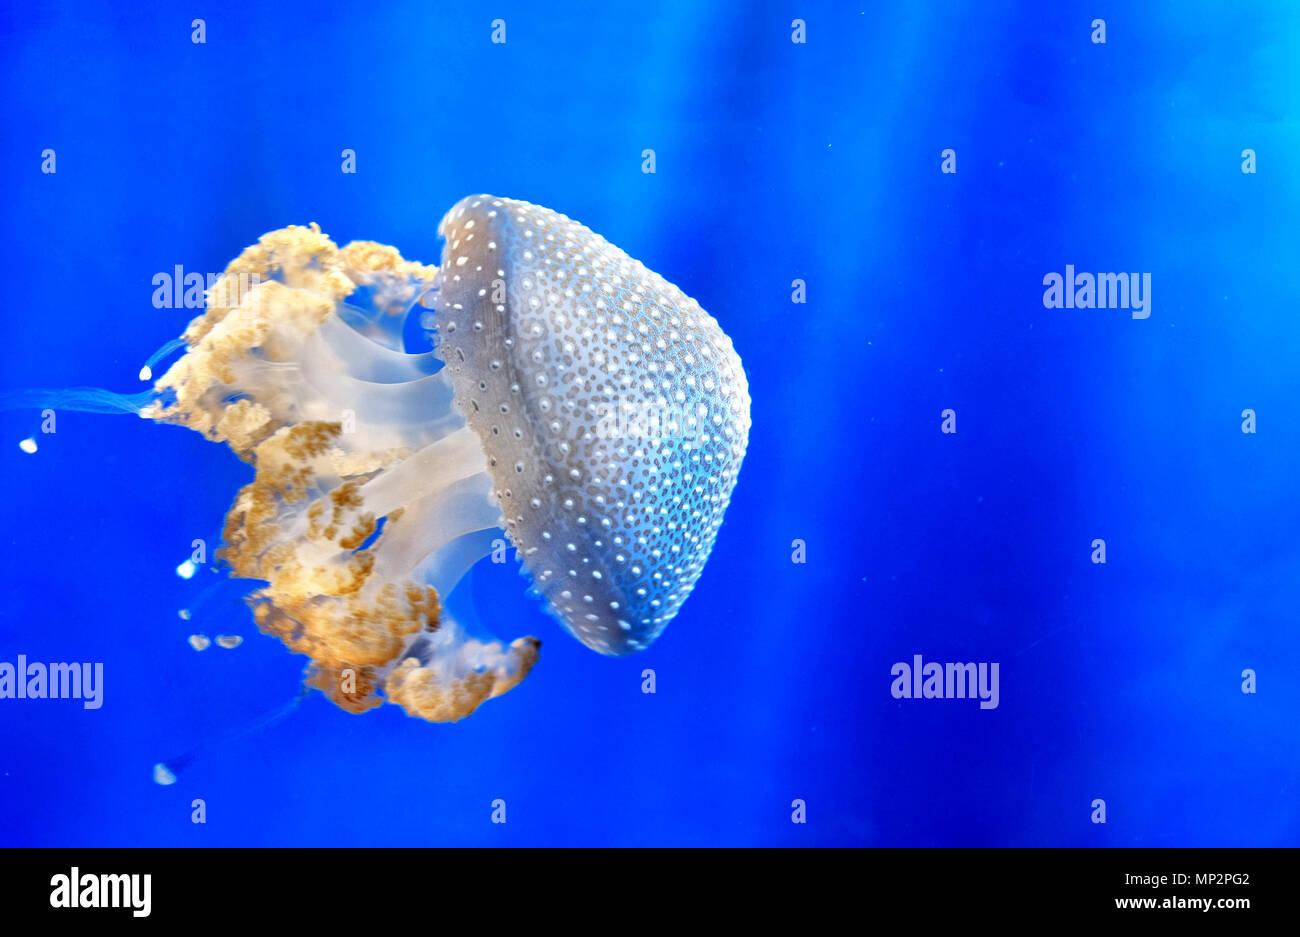 White spotted meduse campana flottante Australian spotted medusa medusa blu profondo sfondo subacquea Immagini Stock